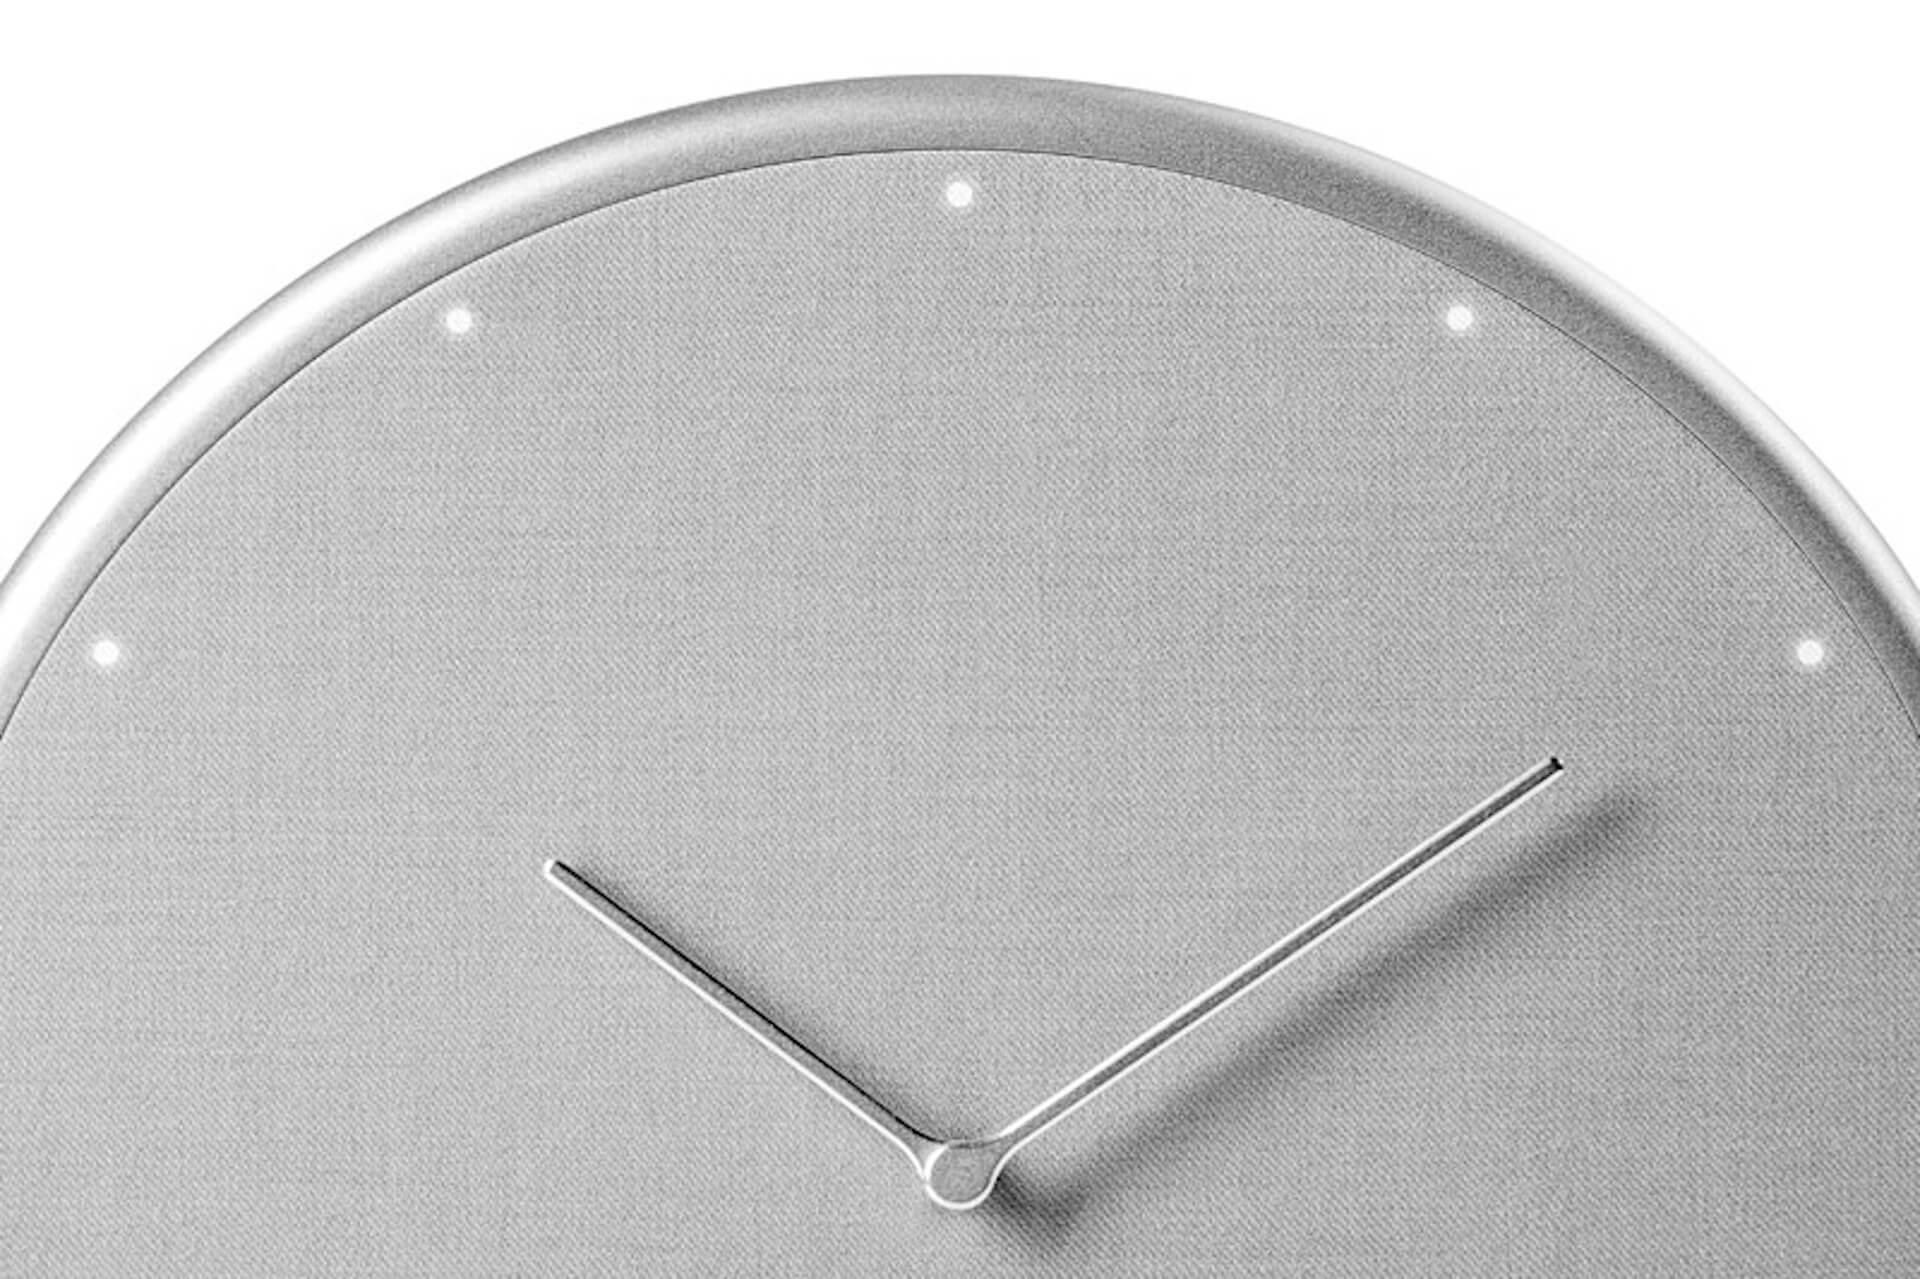 Google・Apple同期でスケジュール管理|忙しい日常をサポートするIoT掛け時計「Glance Clock」が登場 tech190904glanceclock_3